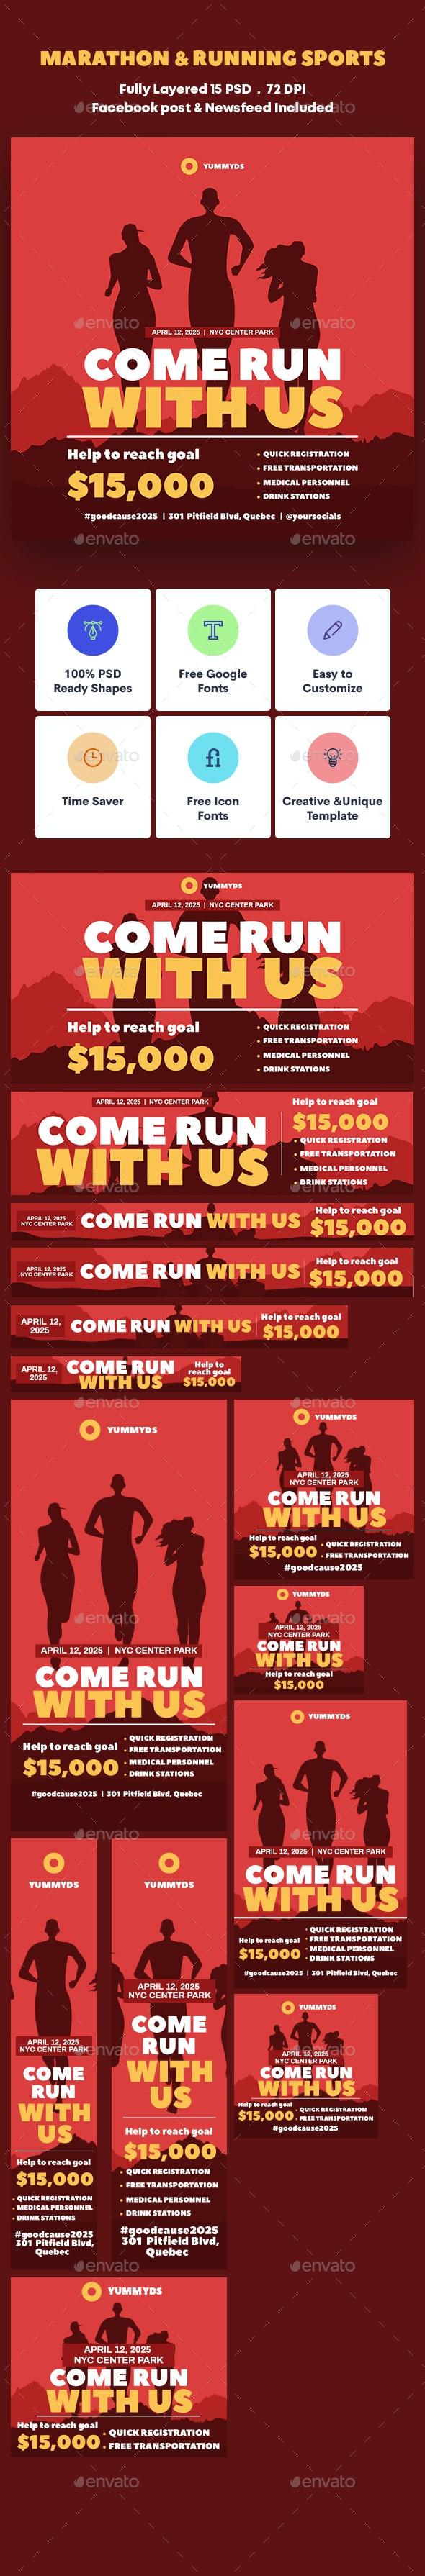 Marathon & Running Sports Banners Ad - Banners & Ads Web Elements